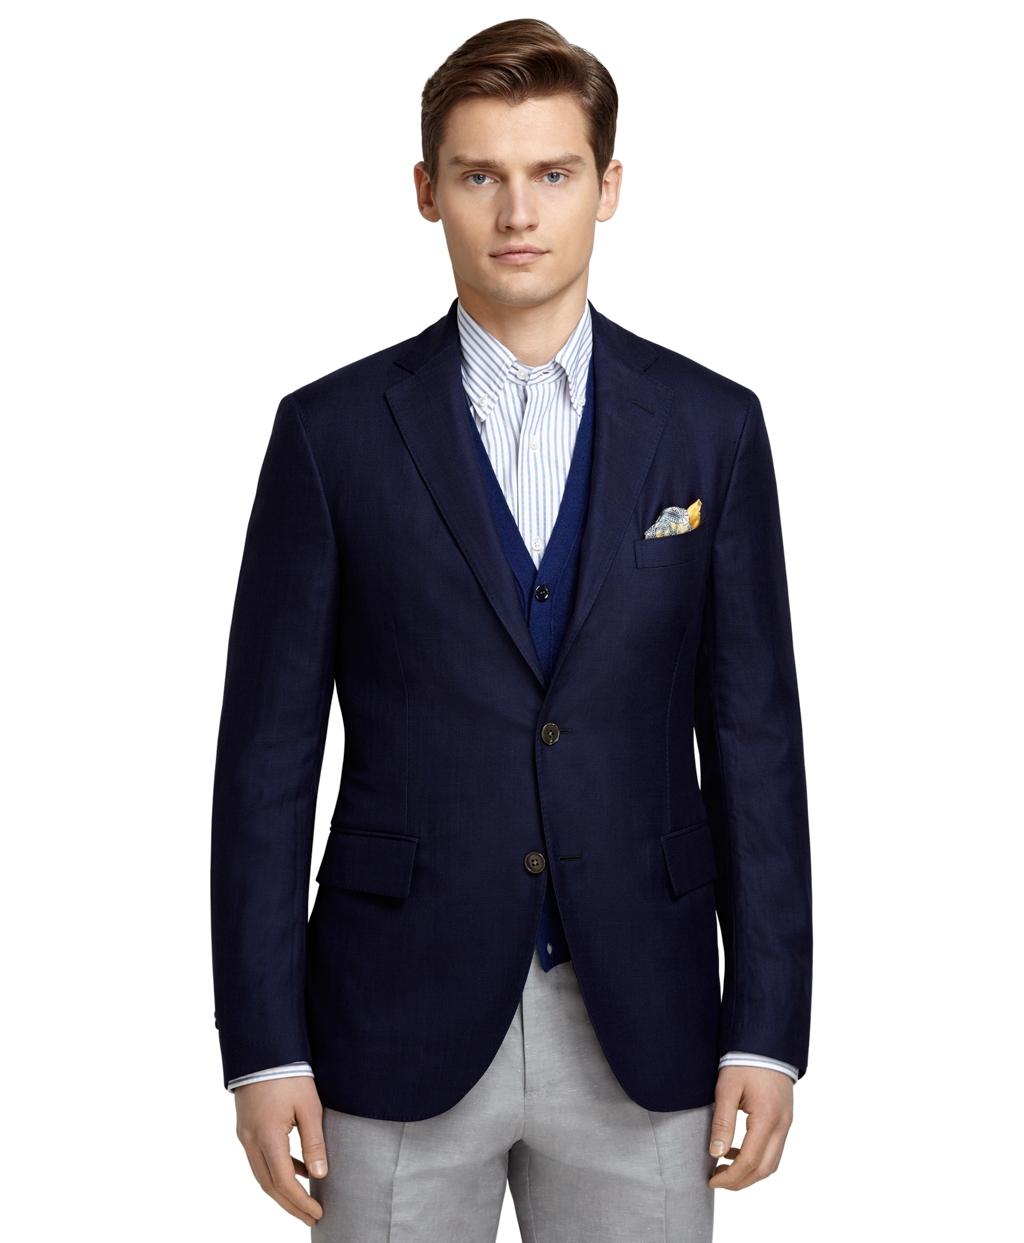 Free shipping and returns on Men's Blue Blazers & Sport Coats at distrib-wq9rfuqq.tk